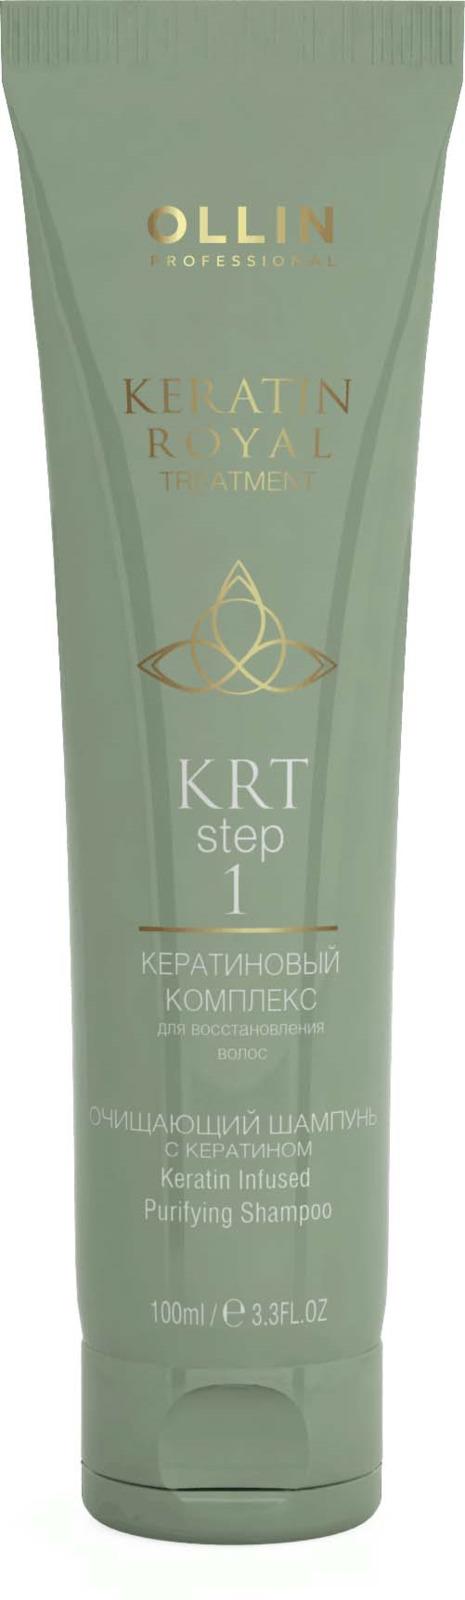 Фото - Ollin Очищающий шампунь с кератином Keratine Royal Treatment Shampoo 100 мл шампунь для волос ollin keratin royal treatment 100 мл очищающий и обогащающий с кератином